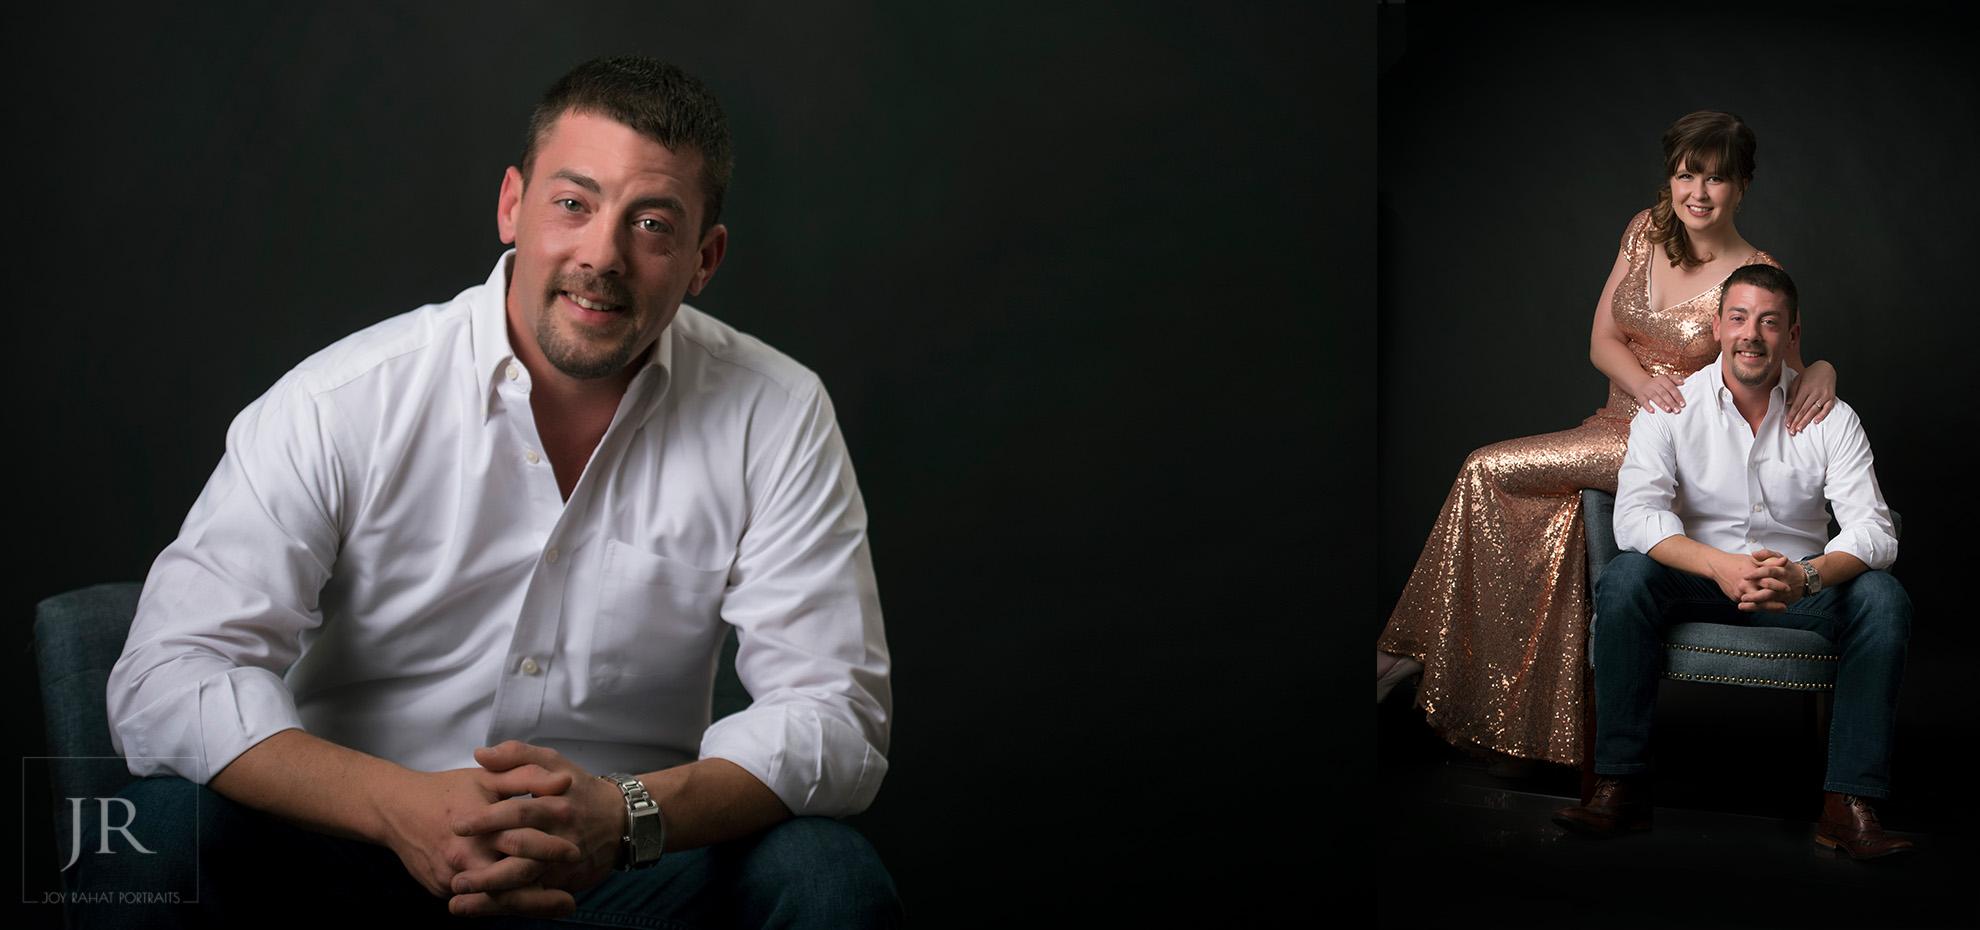 Couple portraits to celebrate wedding anniversary